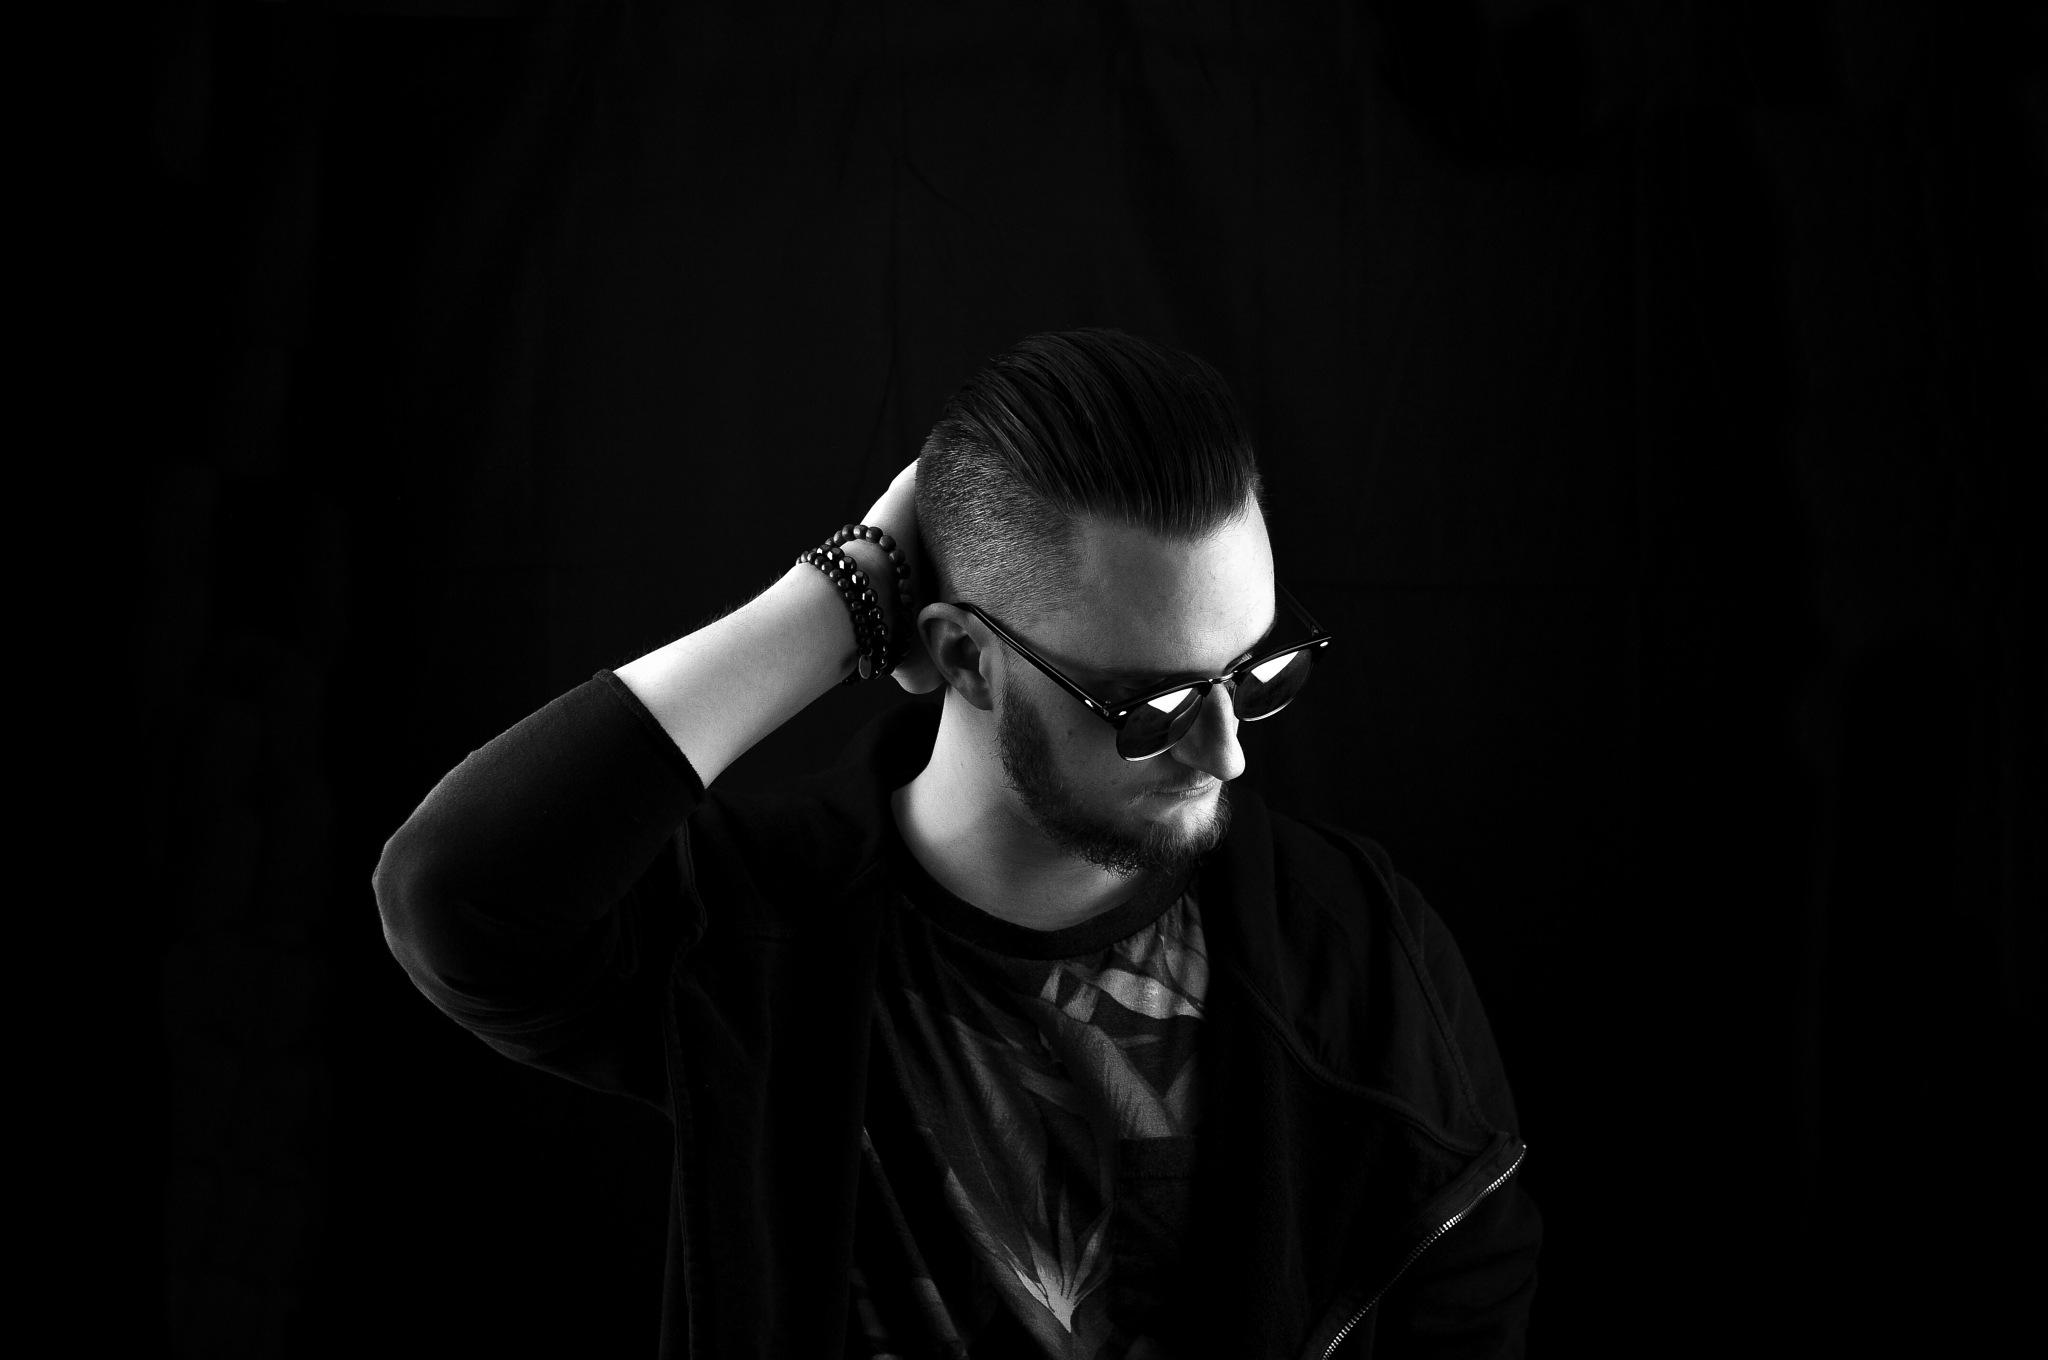 Sunglasses by AlessandroNobili